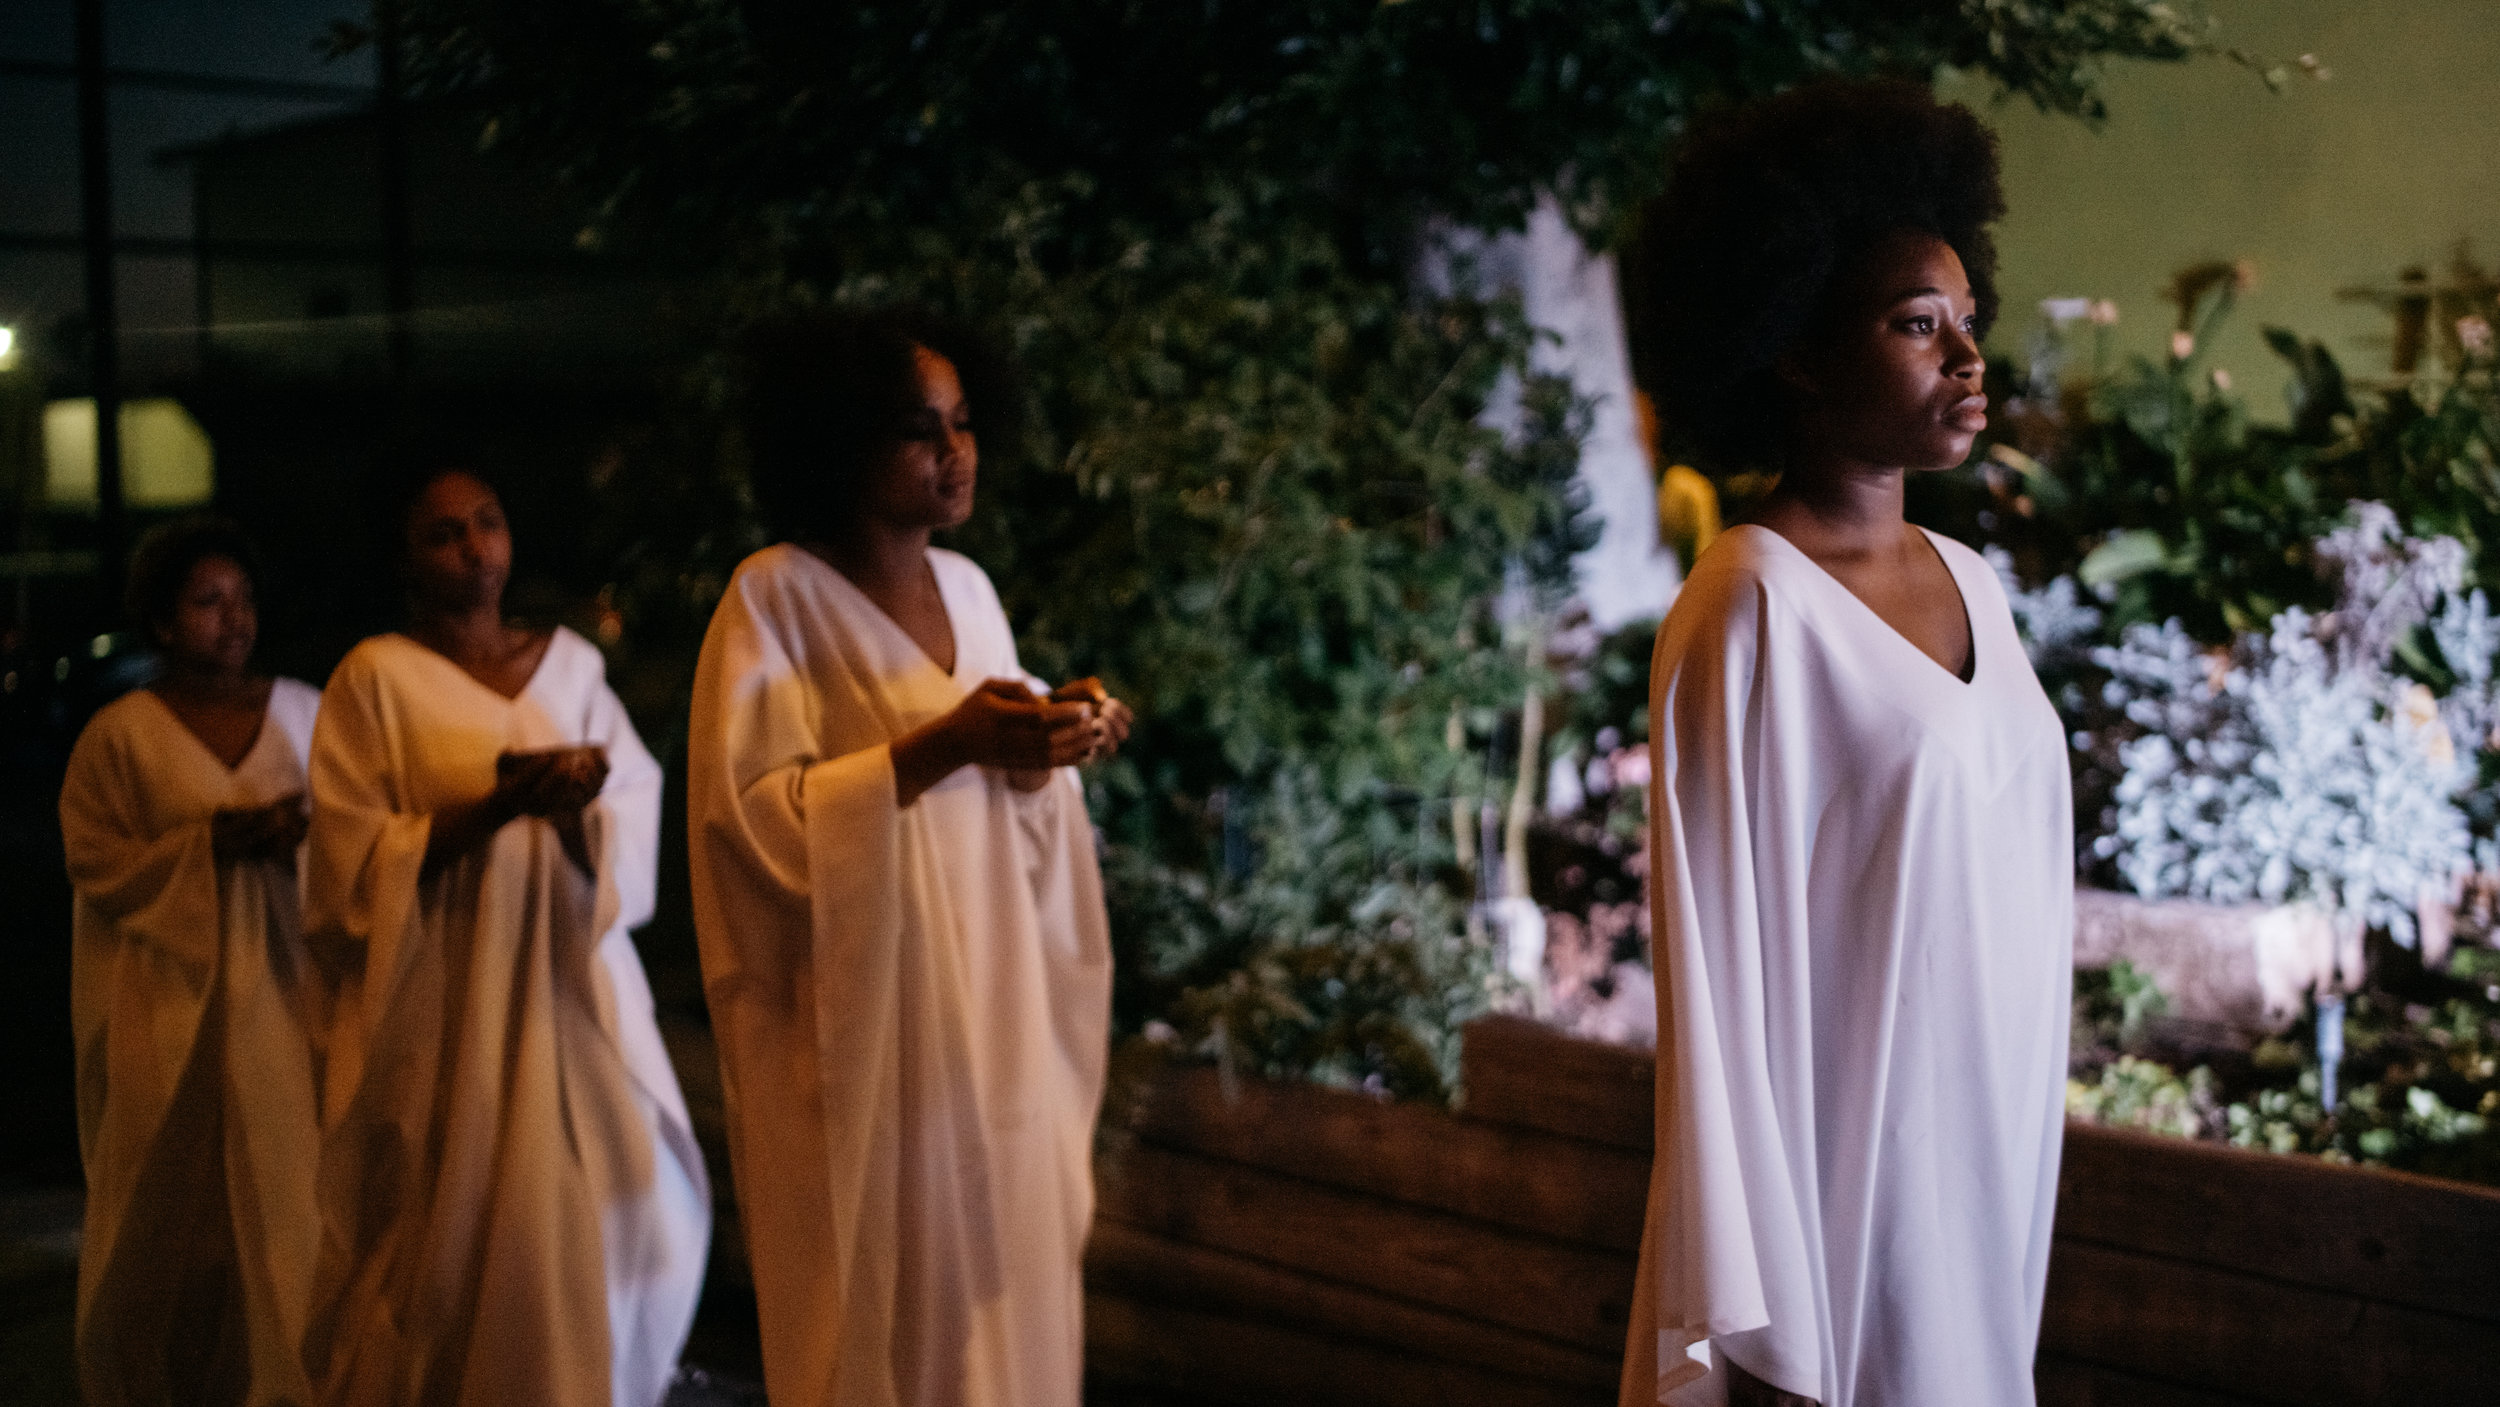 Each  Hairwash  performer walks in white robes towards their destiny.